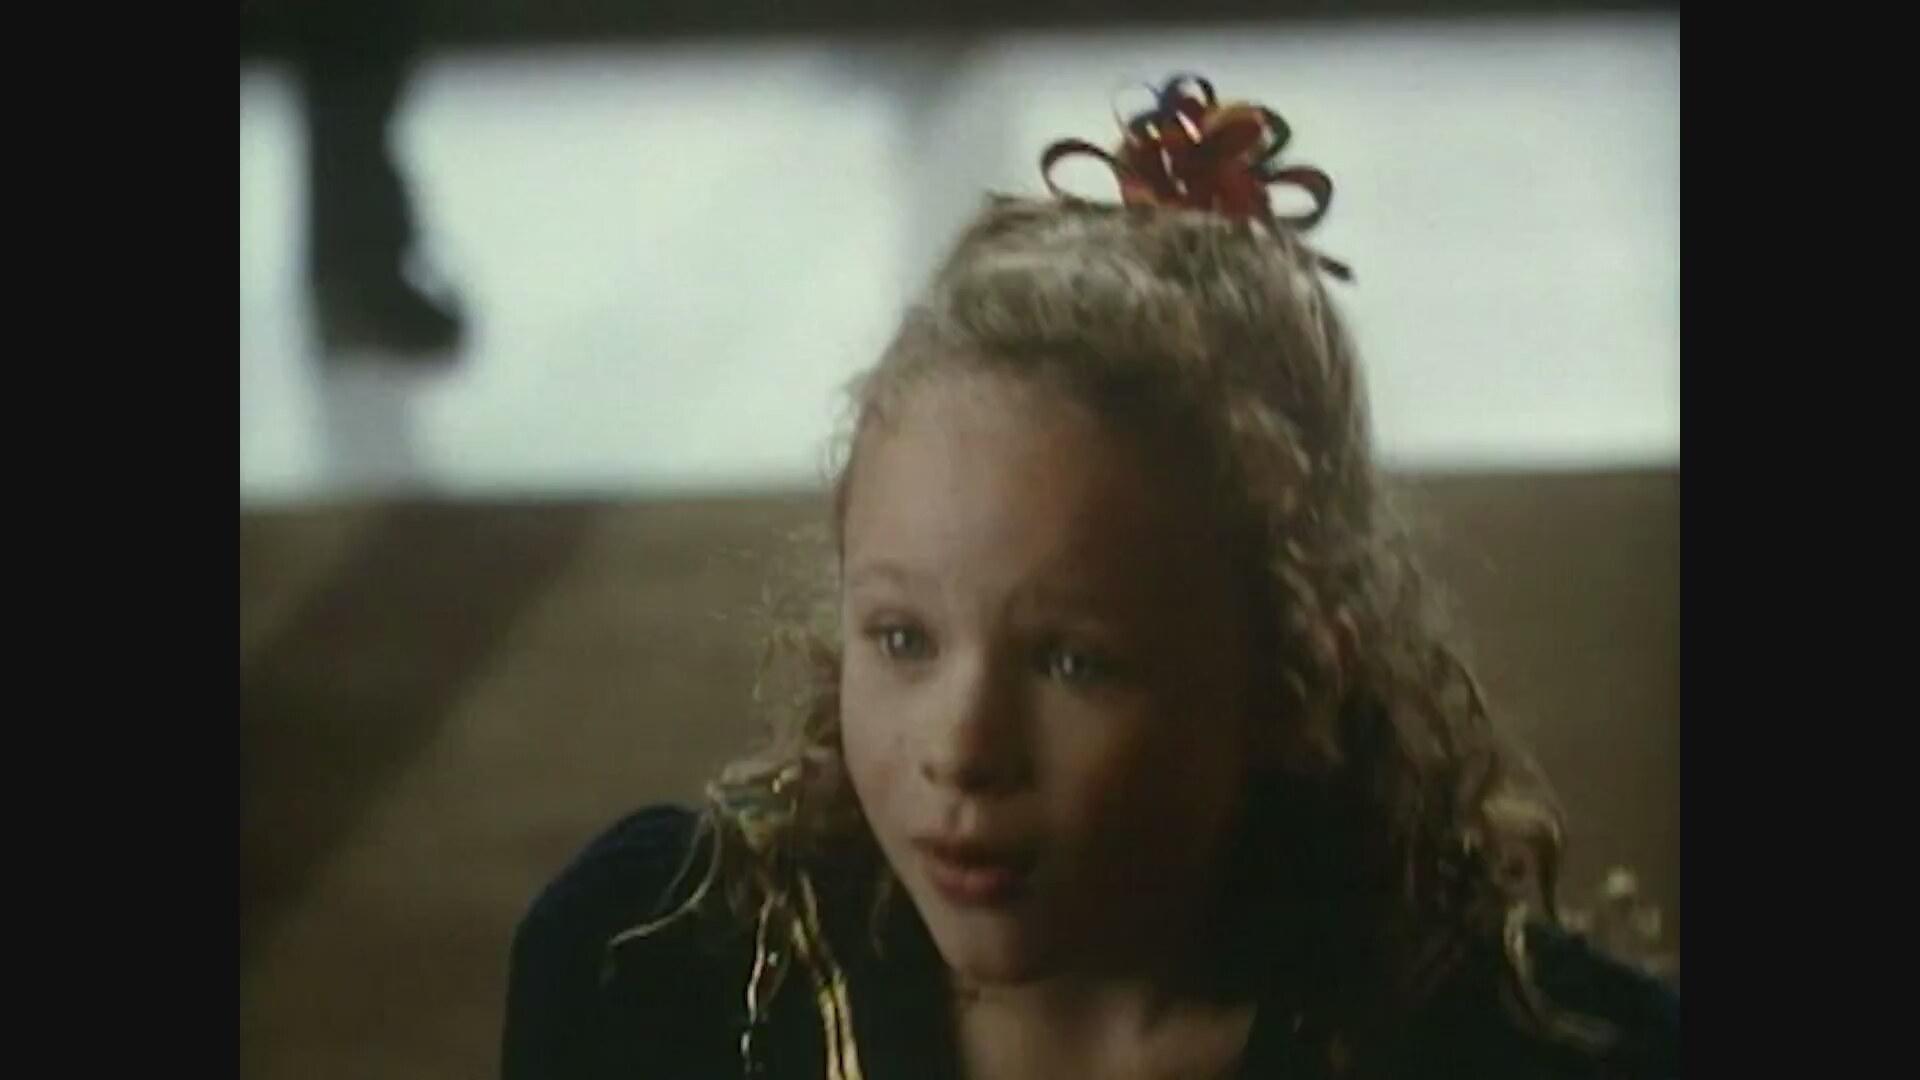 all i want for christmas 1991 fragman - All I Want For Christmas 1991